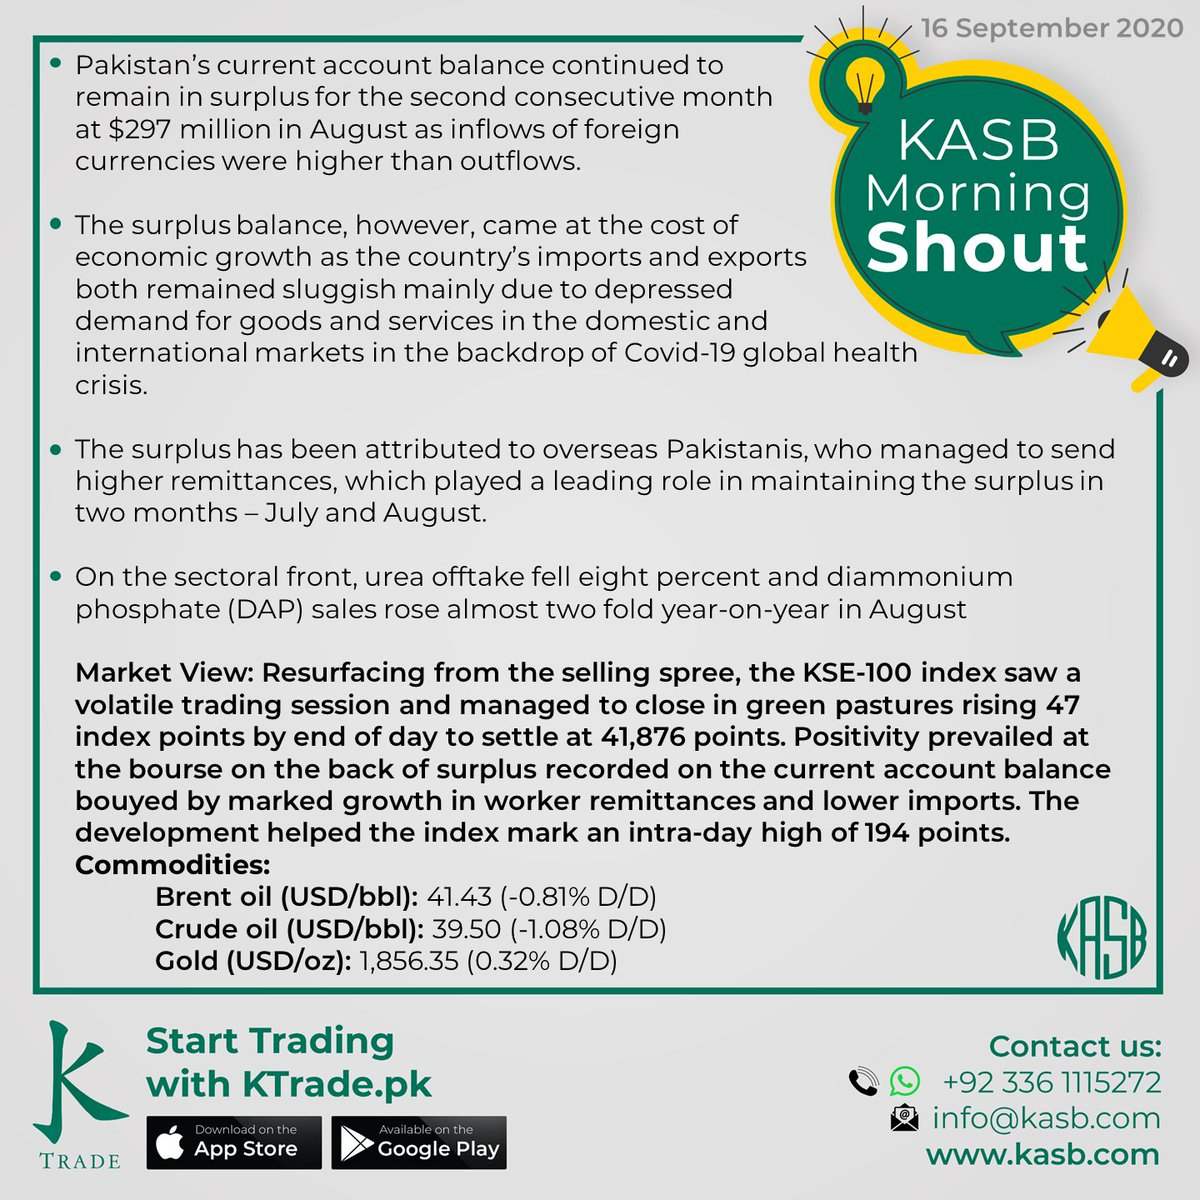 KASB Morning Shout: Our views on today's news #kasb #smartinvesting #psx #stockmarket #KTrade #onlinetrading #pakistaneconomy #imrankhan #sbp #inflation #kse100 #brokeragehouse #psxstocks #marketupdate #emergingmarkets #frontiermarkets #news #morning #today #views https://t.co/DyL5RJTfjQ